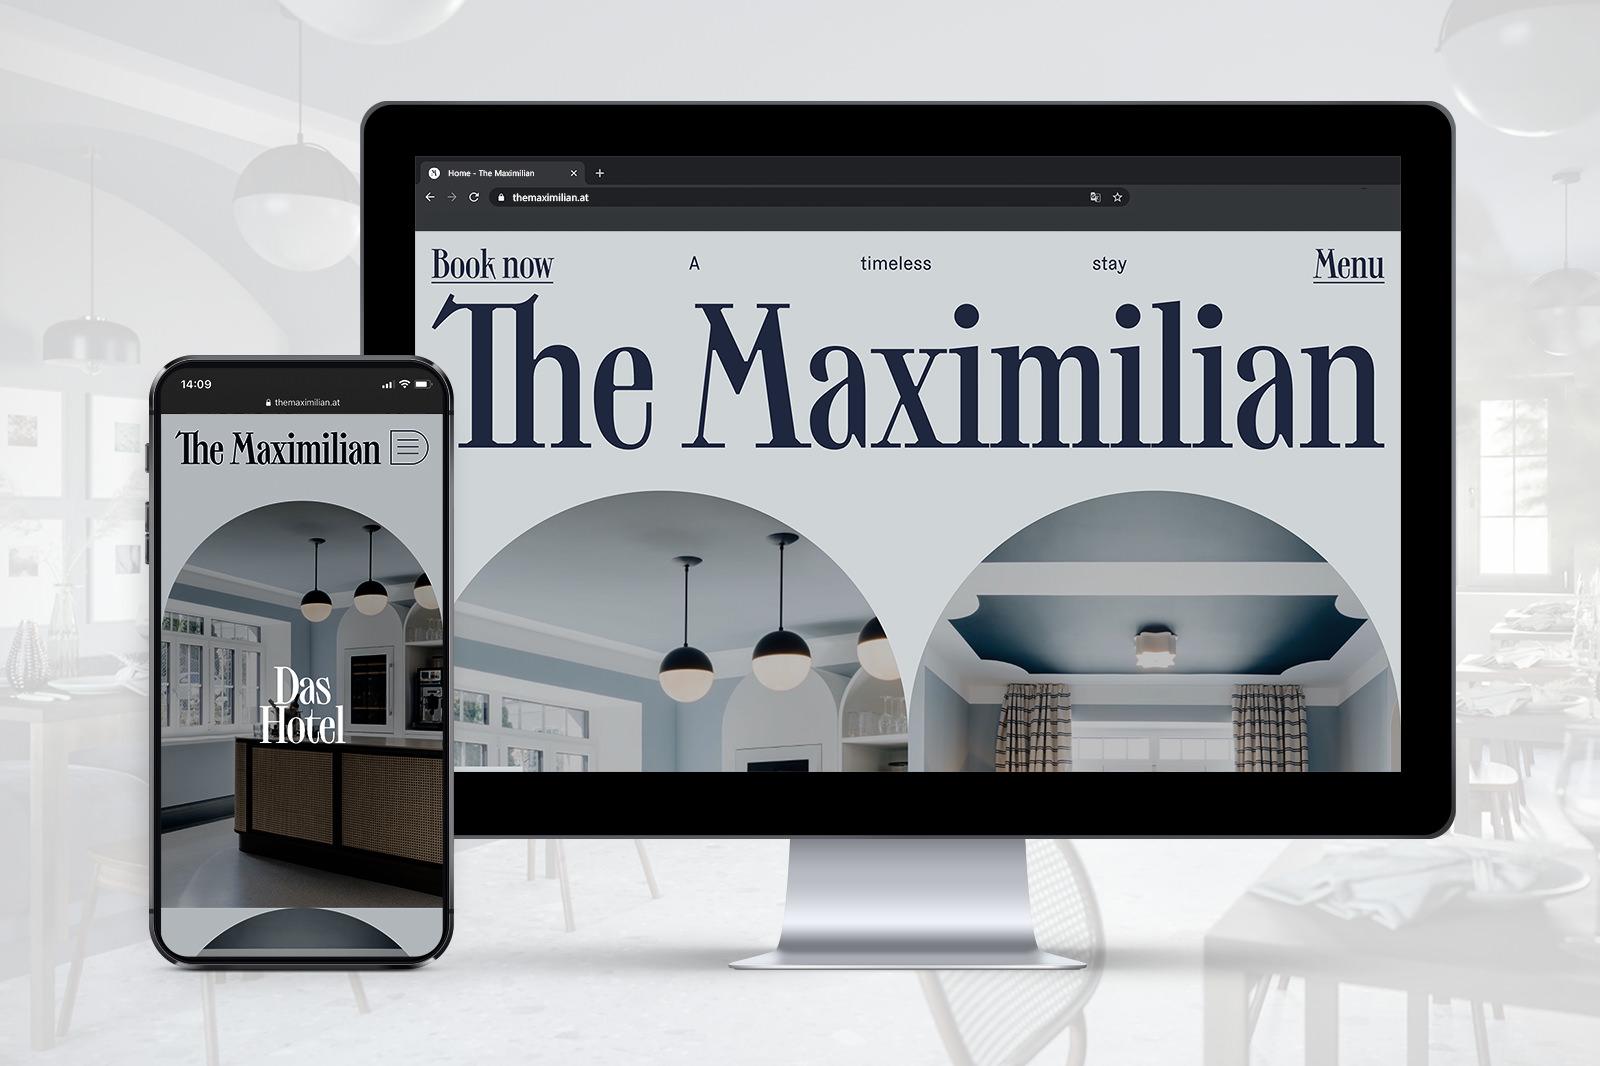 The Maximilian 13